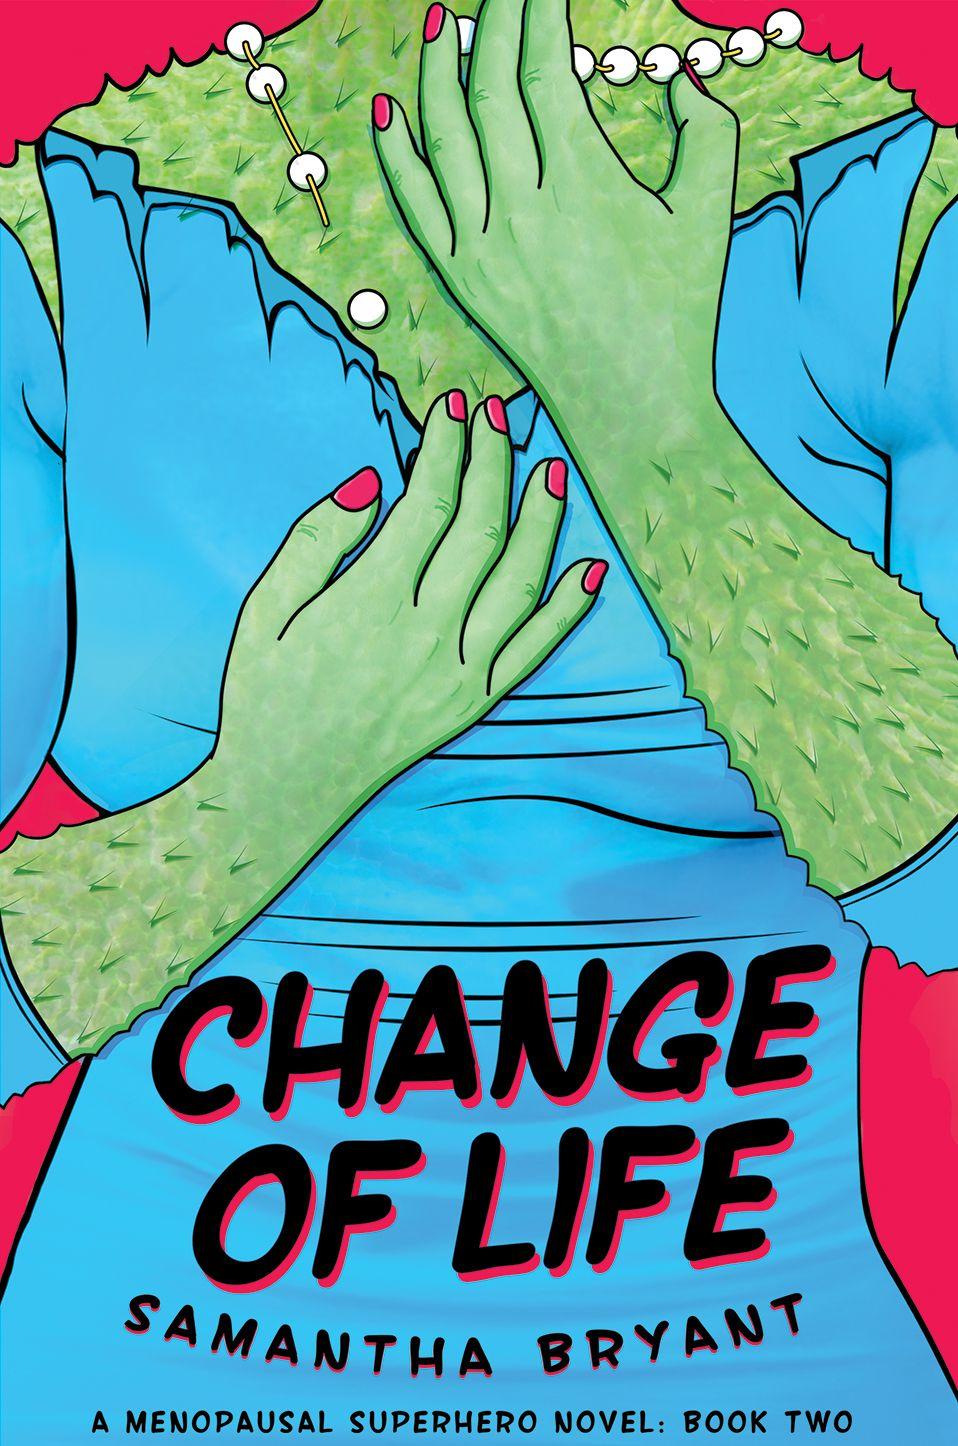 CoL front Superhero novel, Novels, Life changes